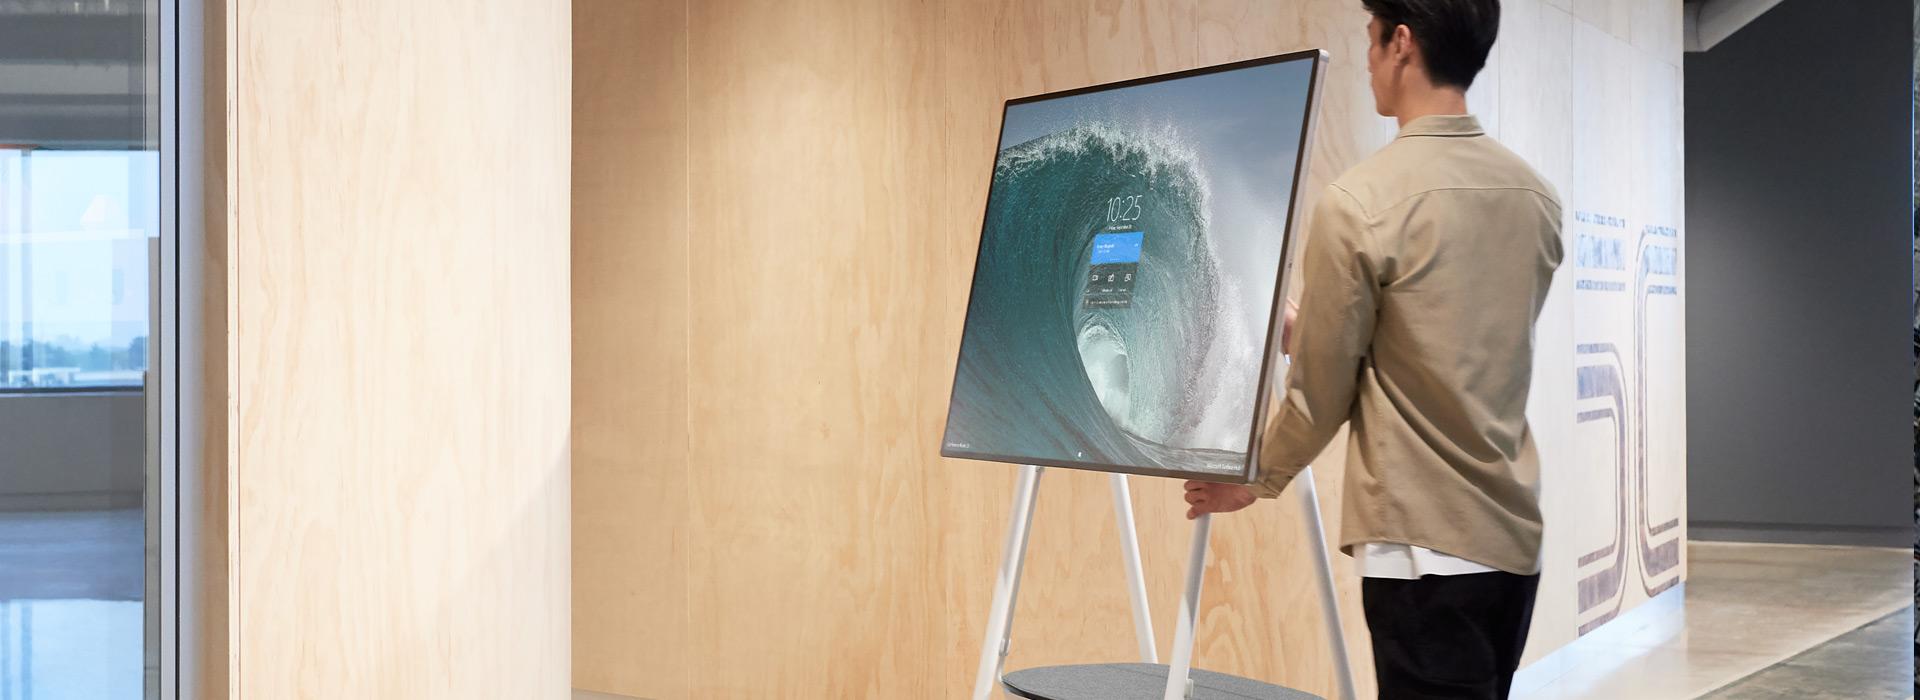 En mand transporterer Surface Hub 2S på et mobilt rullestativ